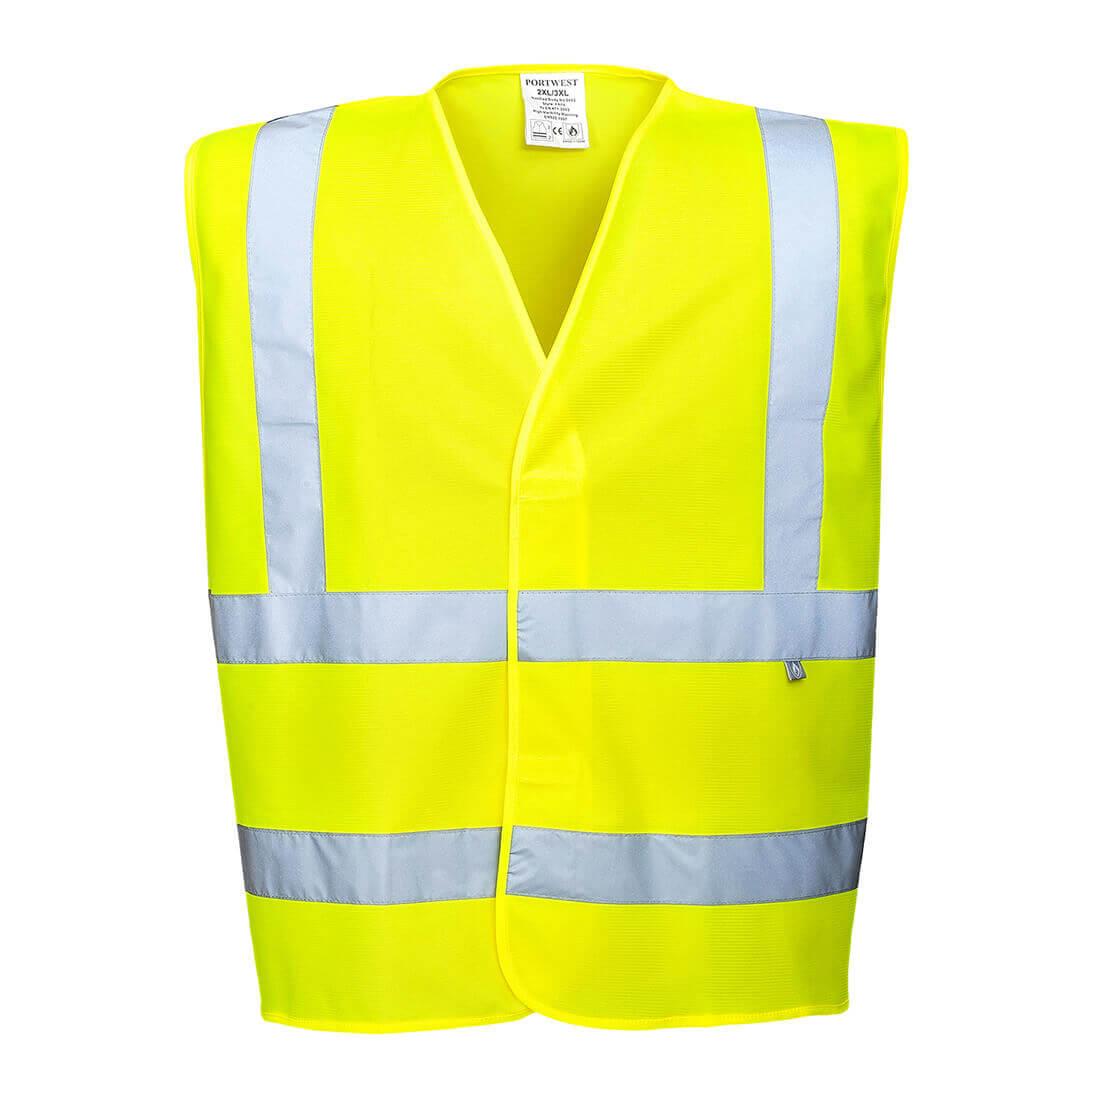 Image of Biz Flame Hi-Vis Flame Resistant Vest Yellow 3XL